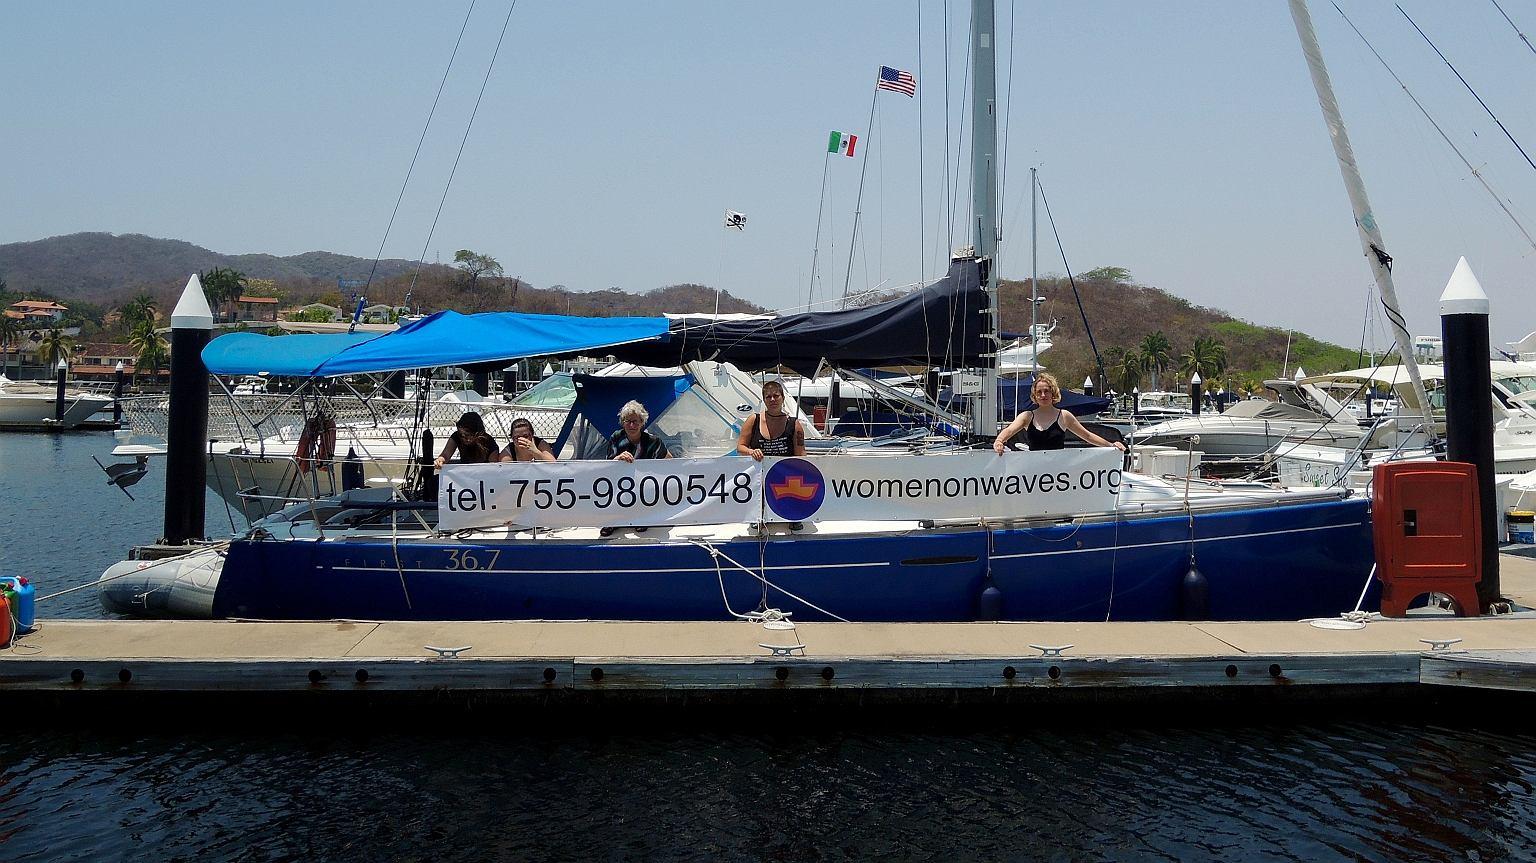 Jacht organizacji Women on Waves